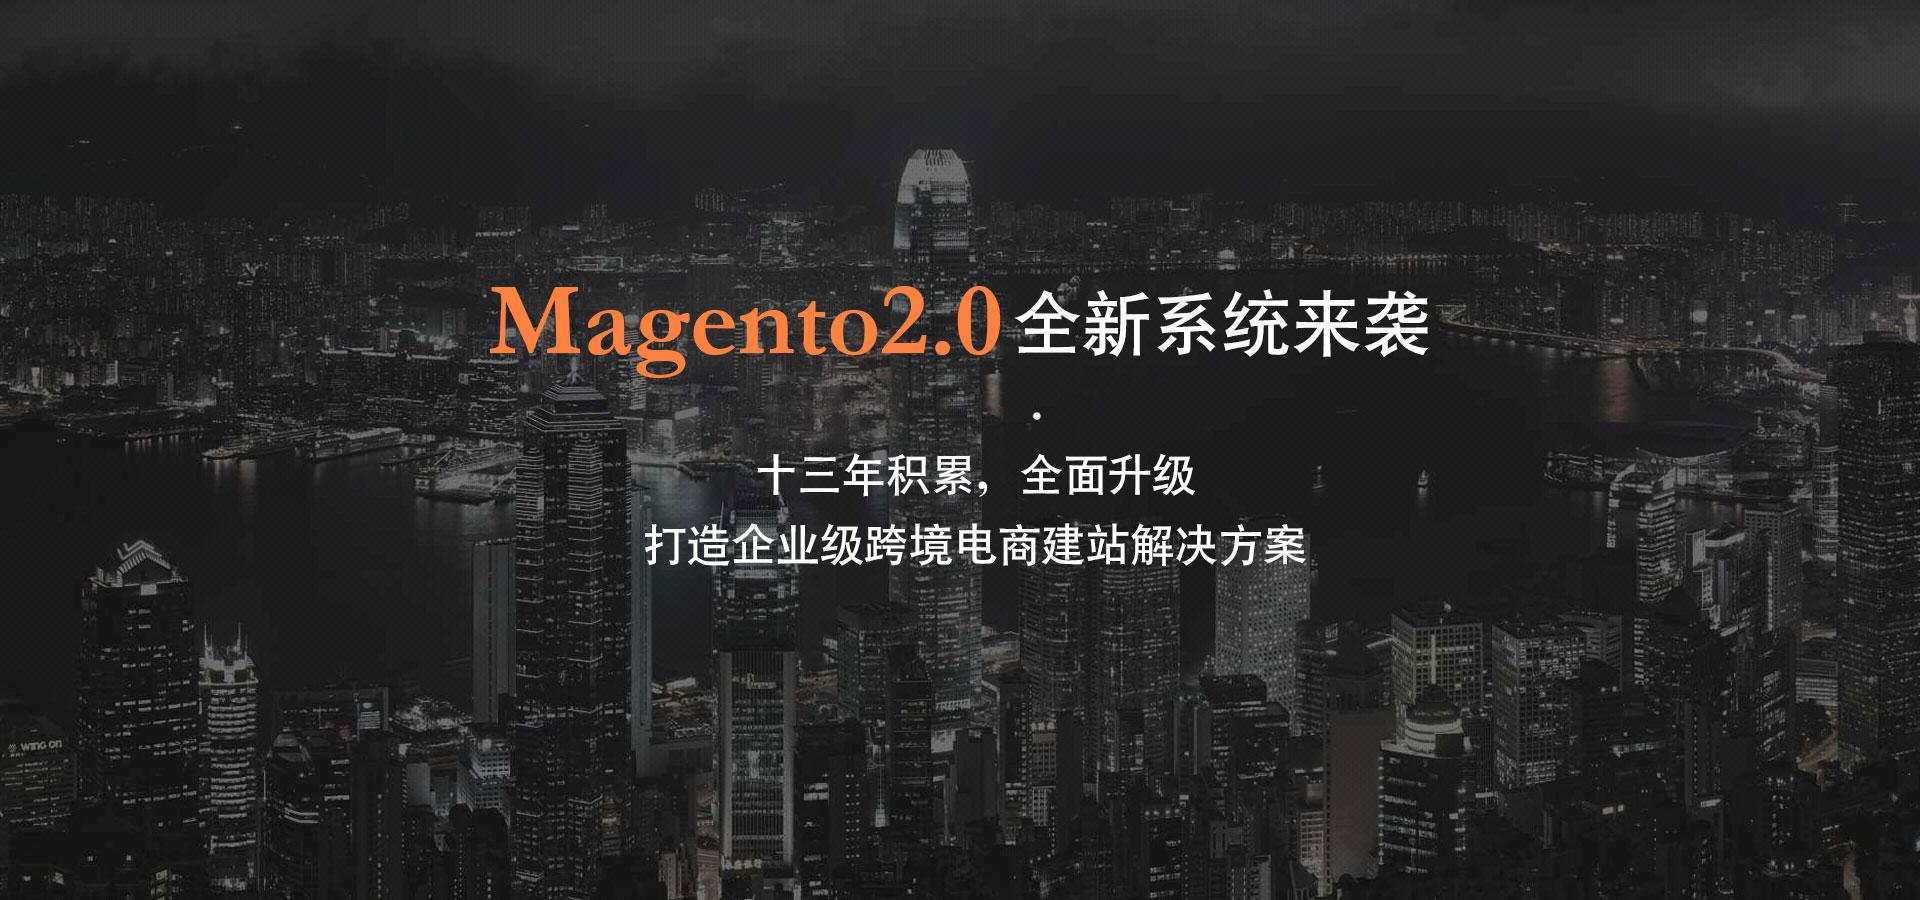 Magento2.0全新系统打造企业级跨境电子商务网站建设解决方案